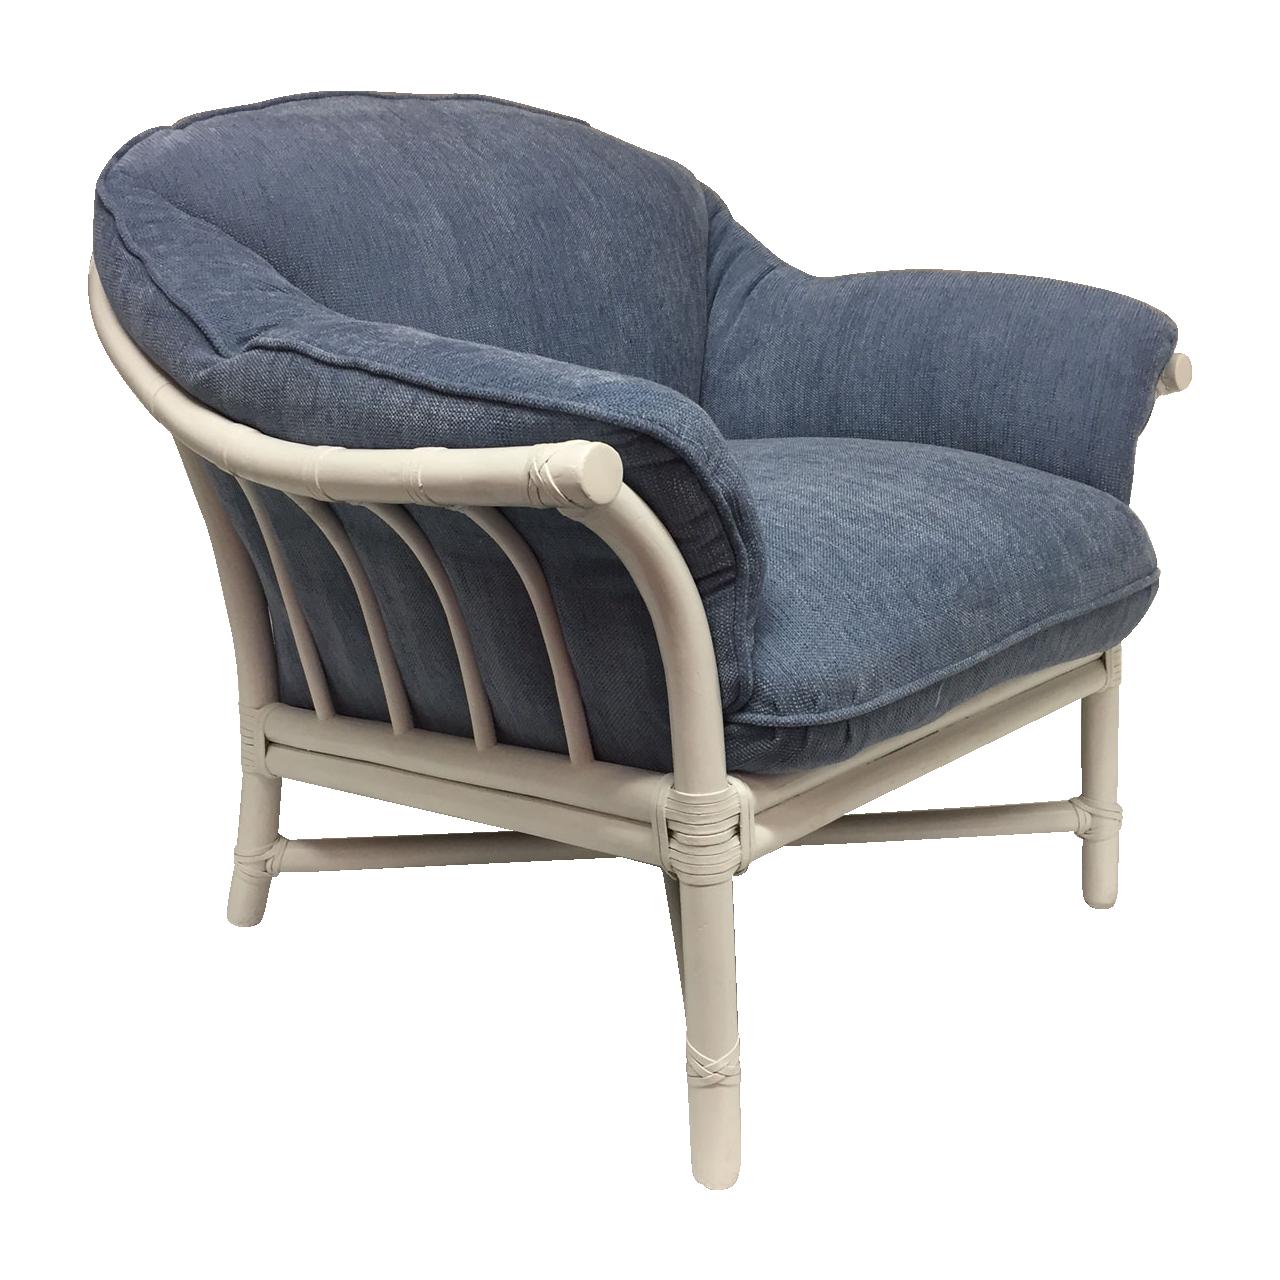 Mcguire Furniture Rattan Bamboo Lounge Chair Chairish